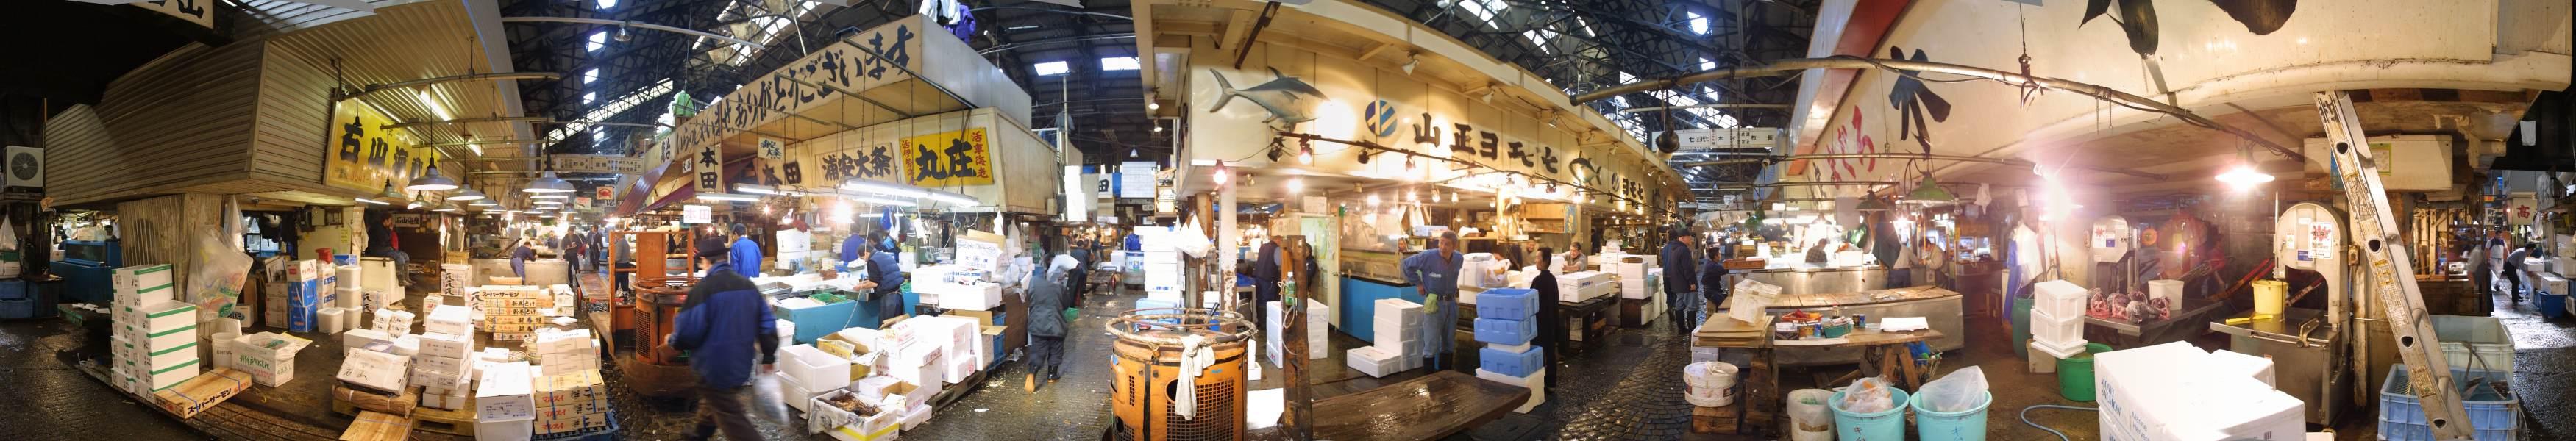 Kanoq for Andreas fish market